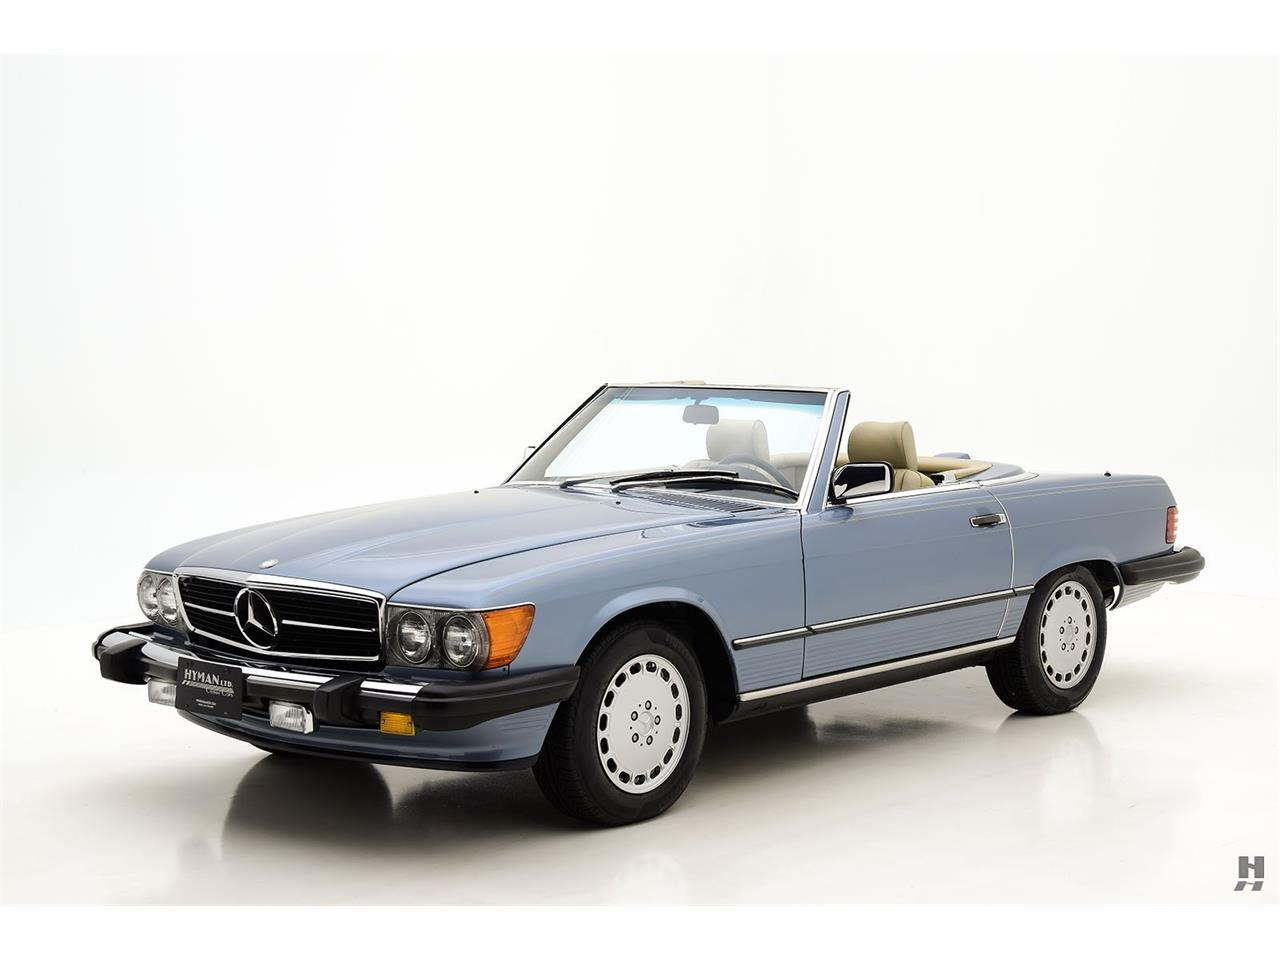 Large Picture of '87 Mercedes-Benz 560SL located in Saint Louis Missouri - $48,500.00 - LENL